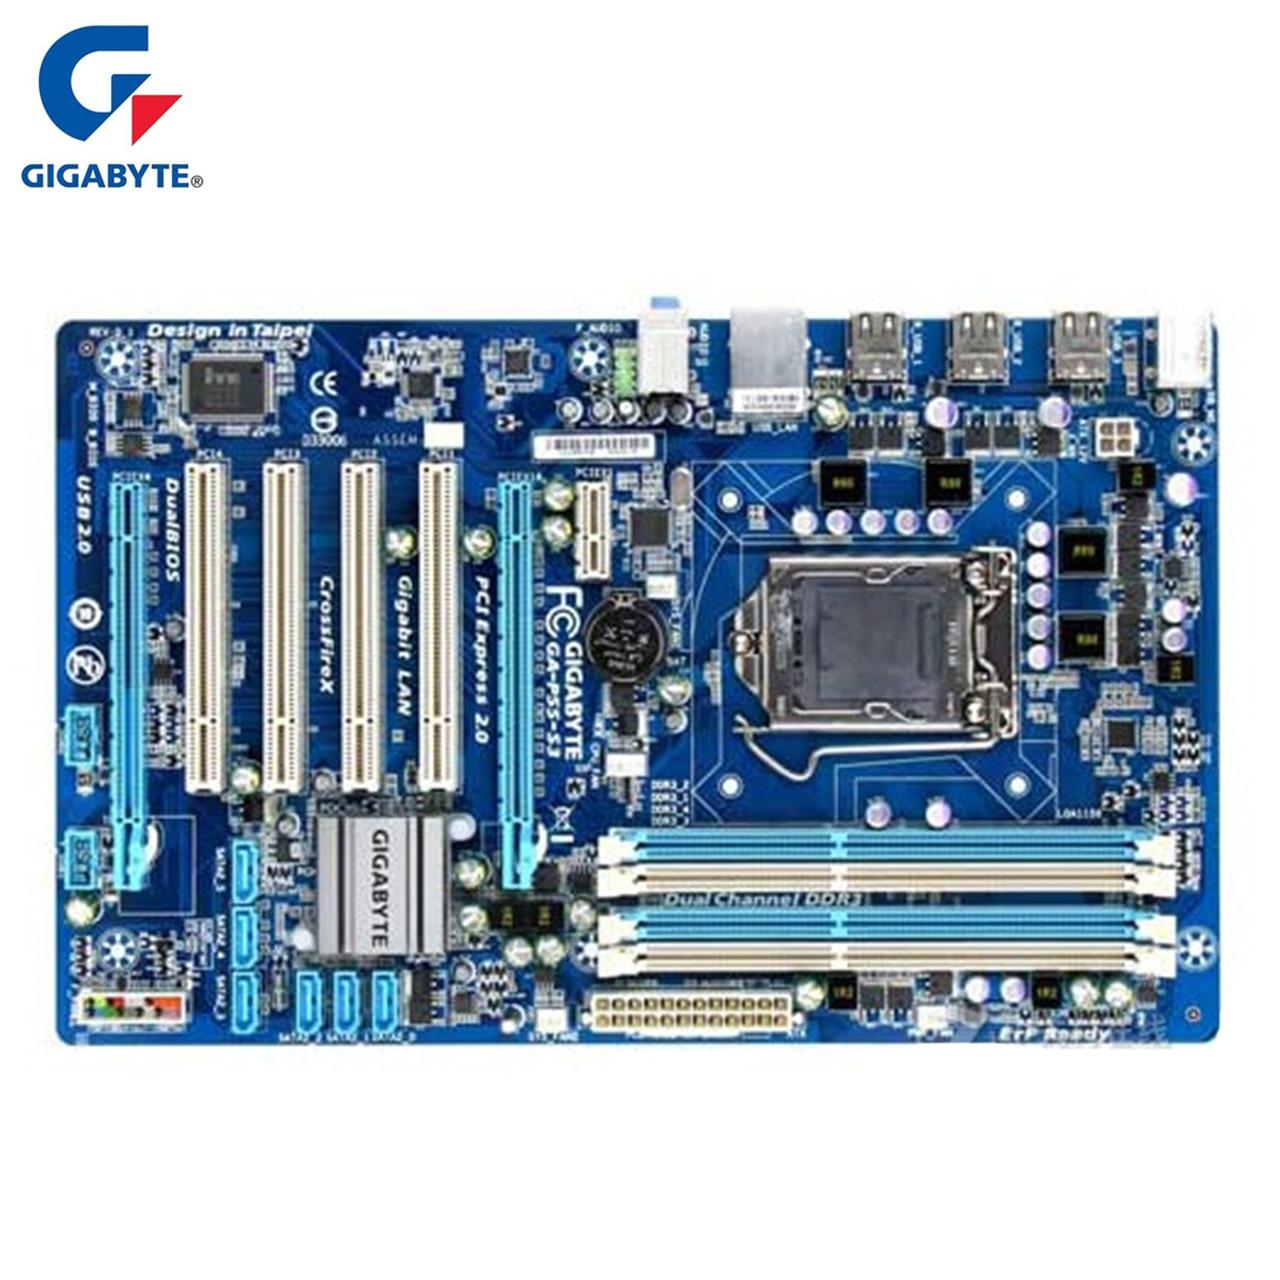 Gigabyte GA P55 S3 100% Original Motherboard LGA 1156 DDR3 16G H55 P55 S3 P55 S3 Desktop Mainboard Systemboard Used Mother board